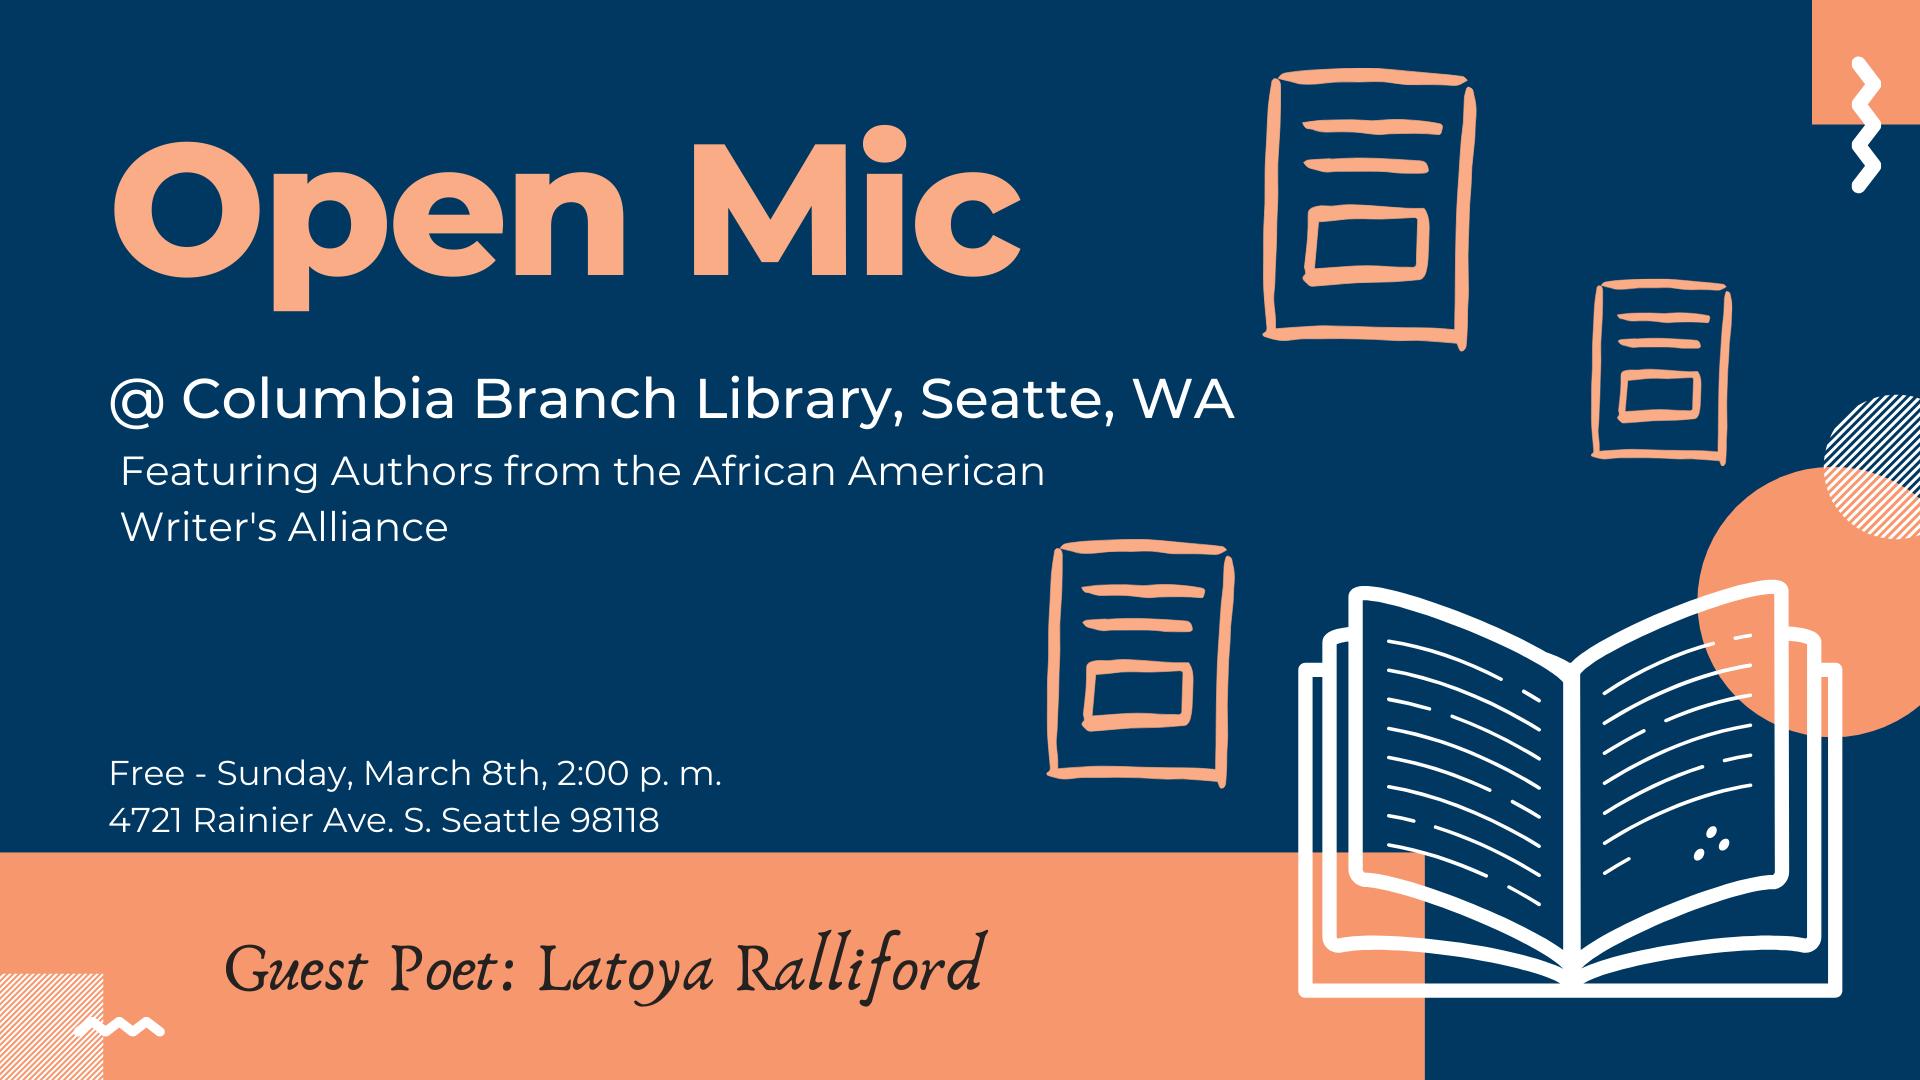 Spoken Word - Open Mic @ Columbia Branch of Seattle Public Library